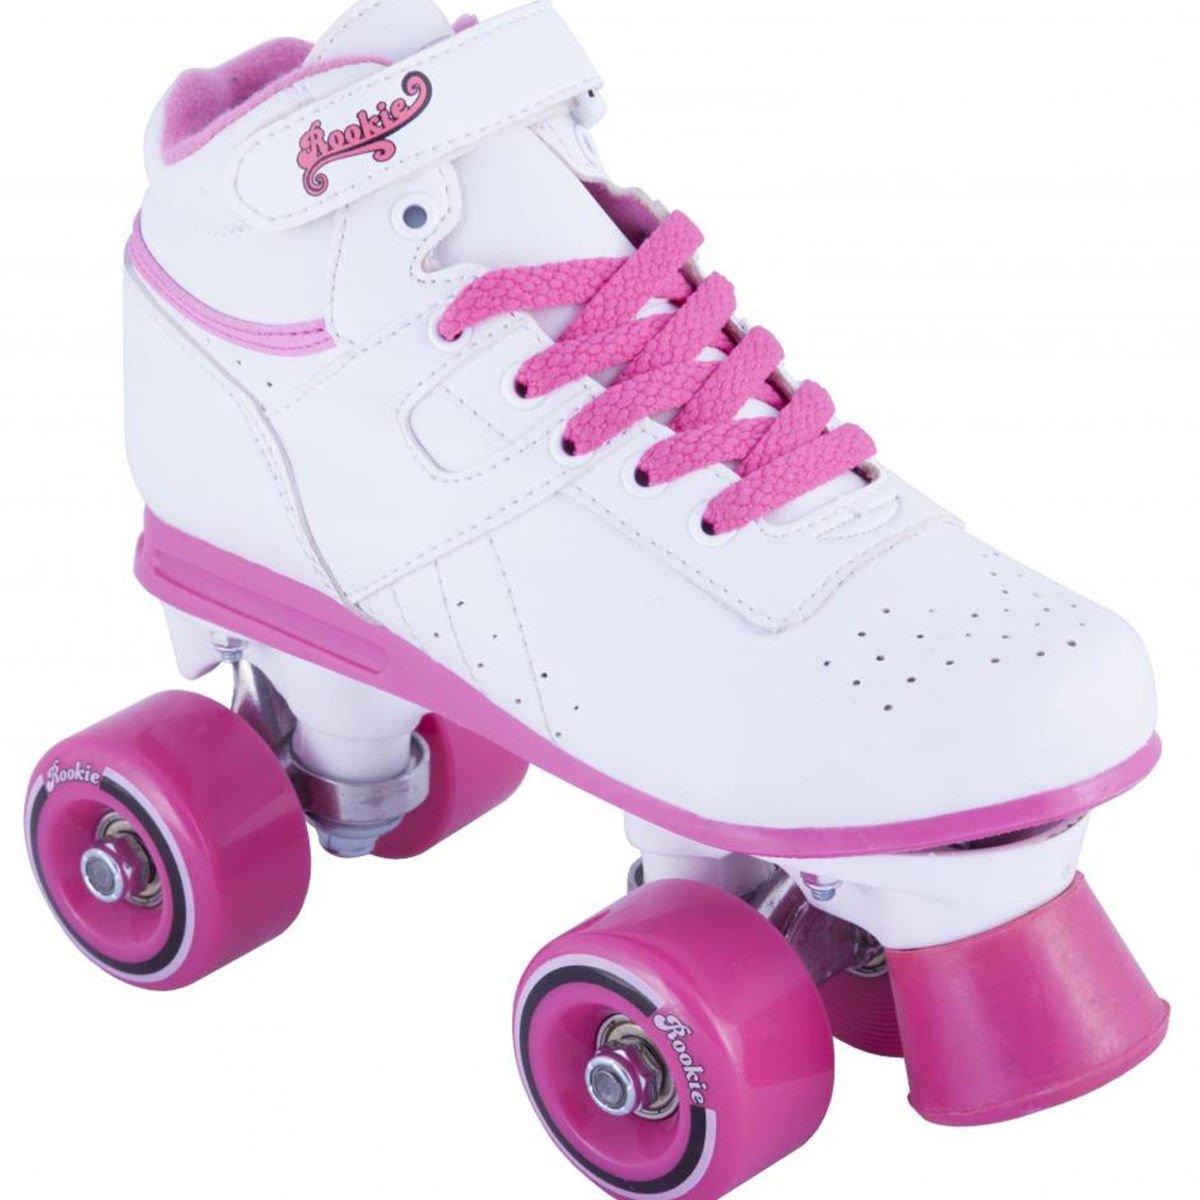 Rookie roller skates amazon - Rookie Odyssey Child Roller Skates White Pink Amazon Co Uk Toys Games